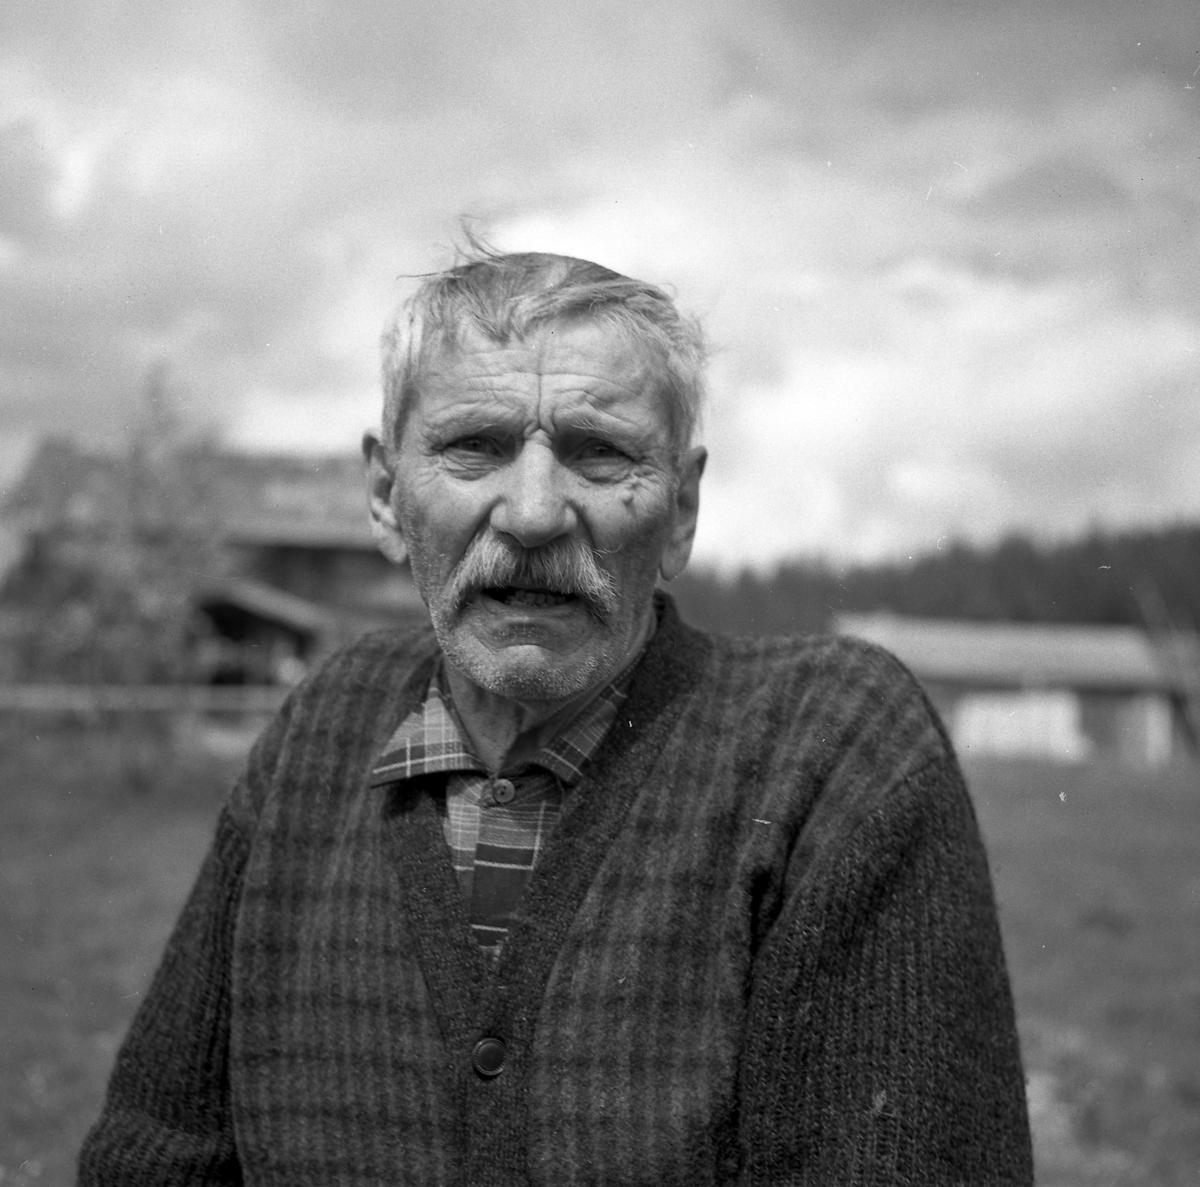 Olaf Heggbrena